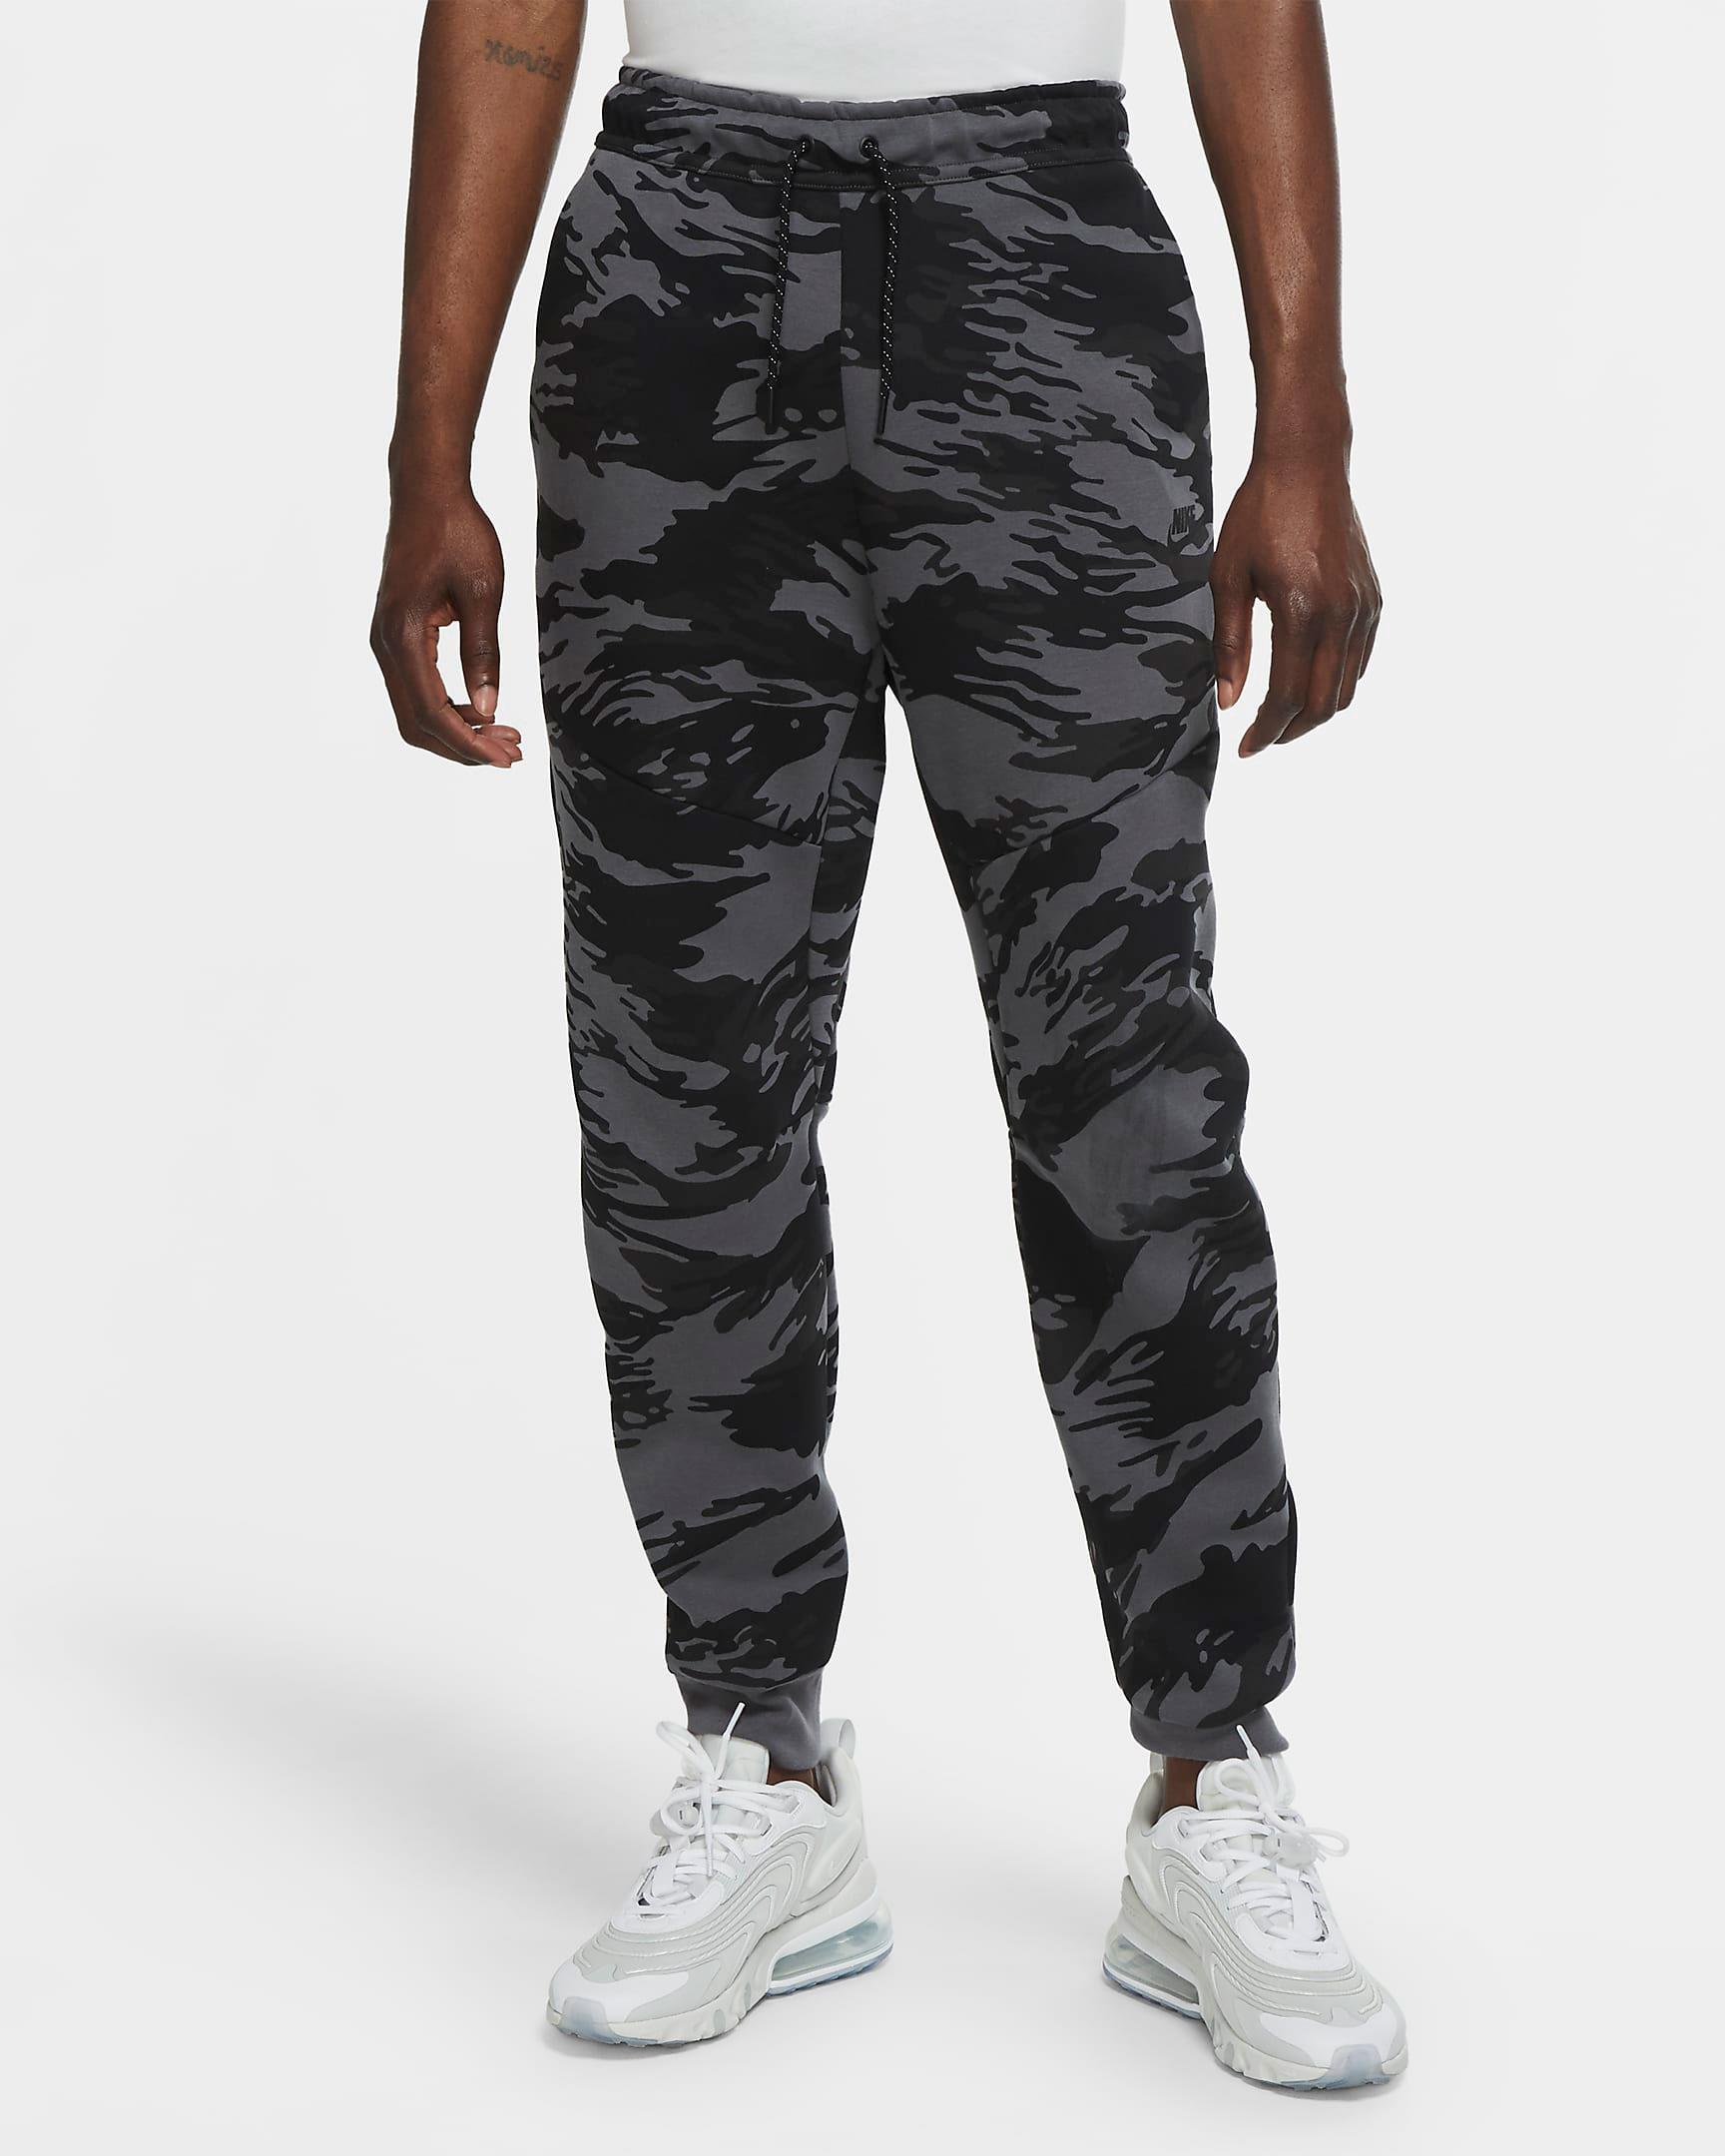 nike-tech-fleece-camo-black-grey-jogger-pants